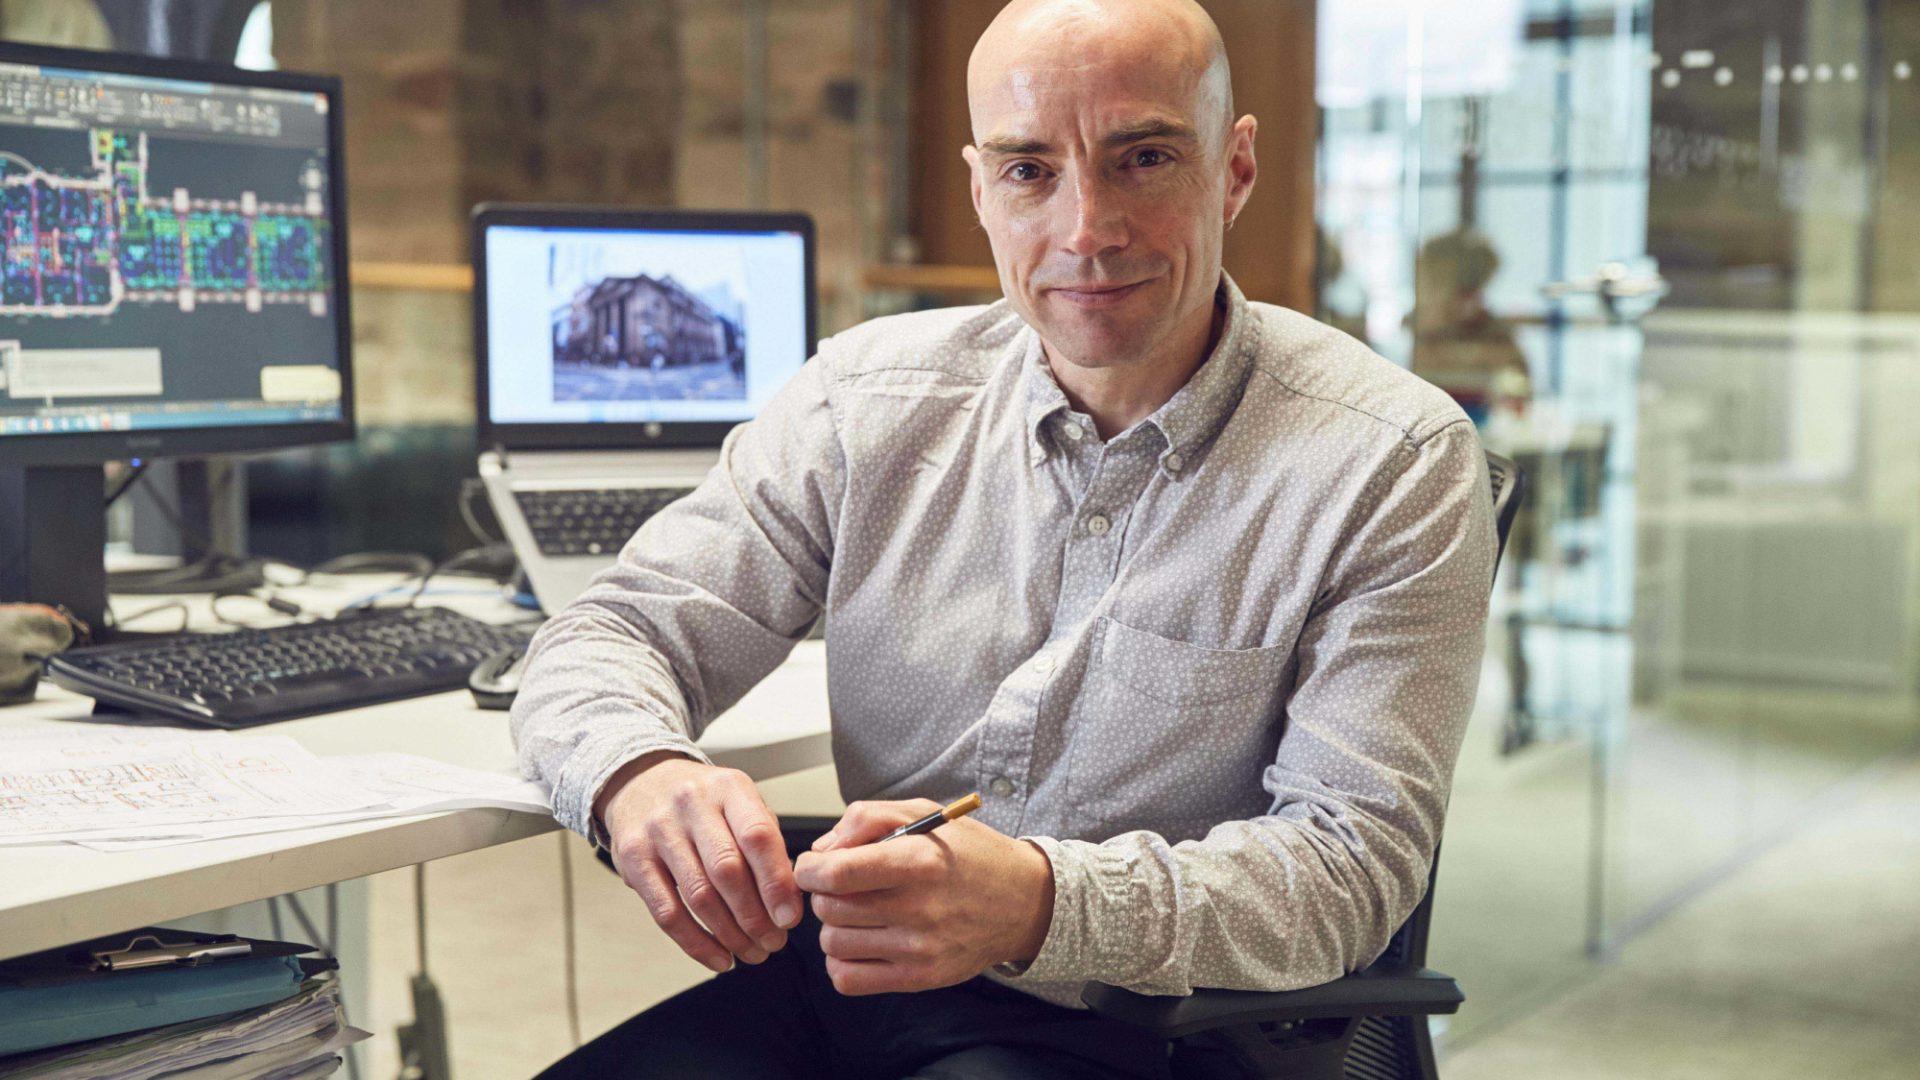 Gareth Richings